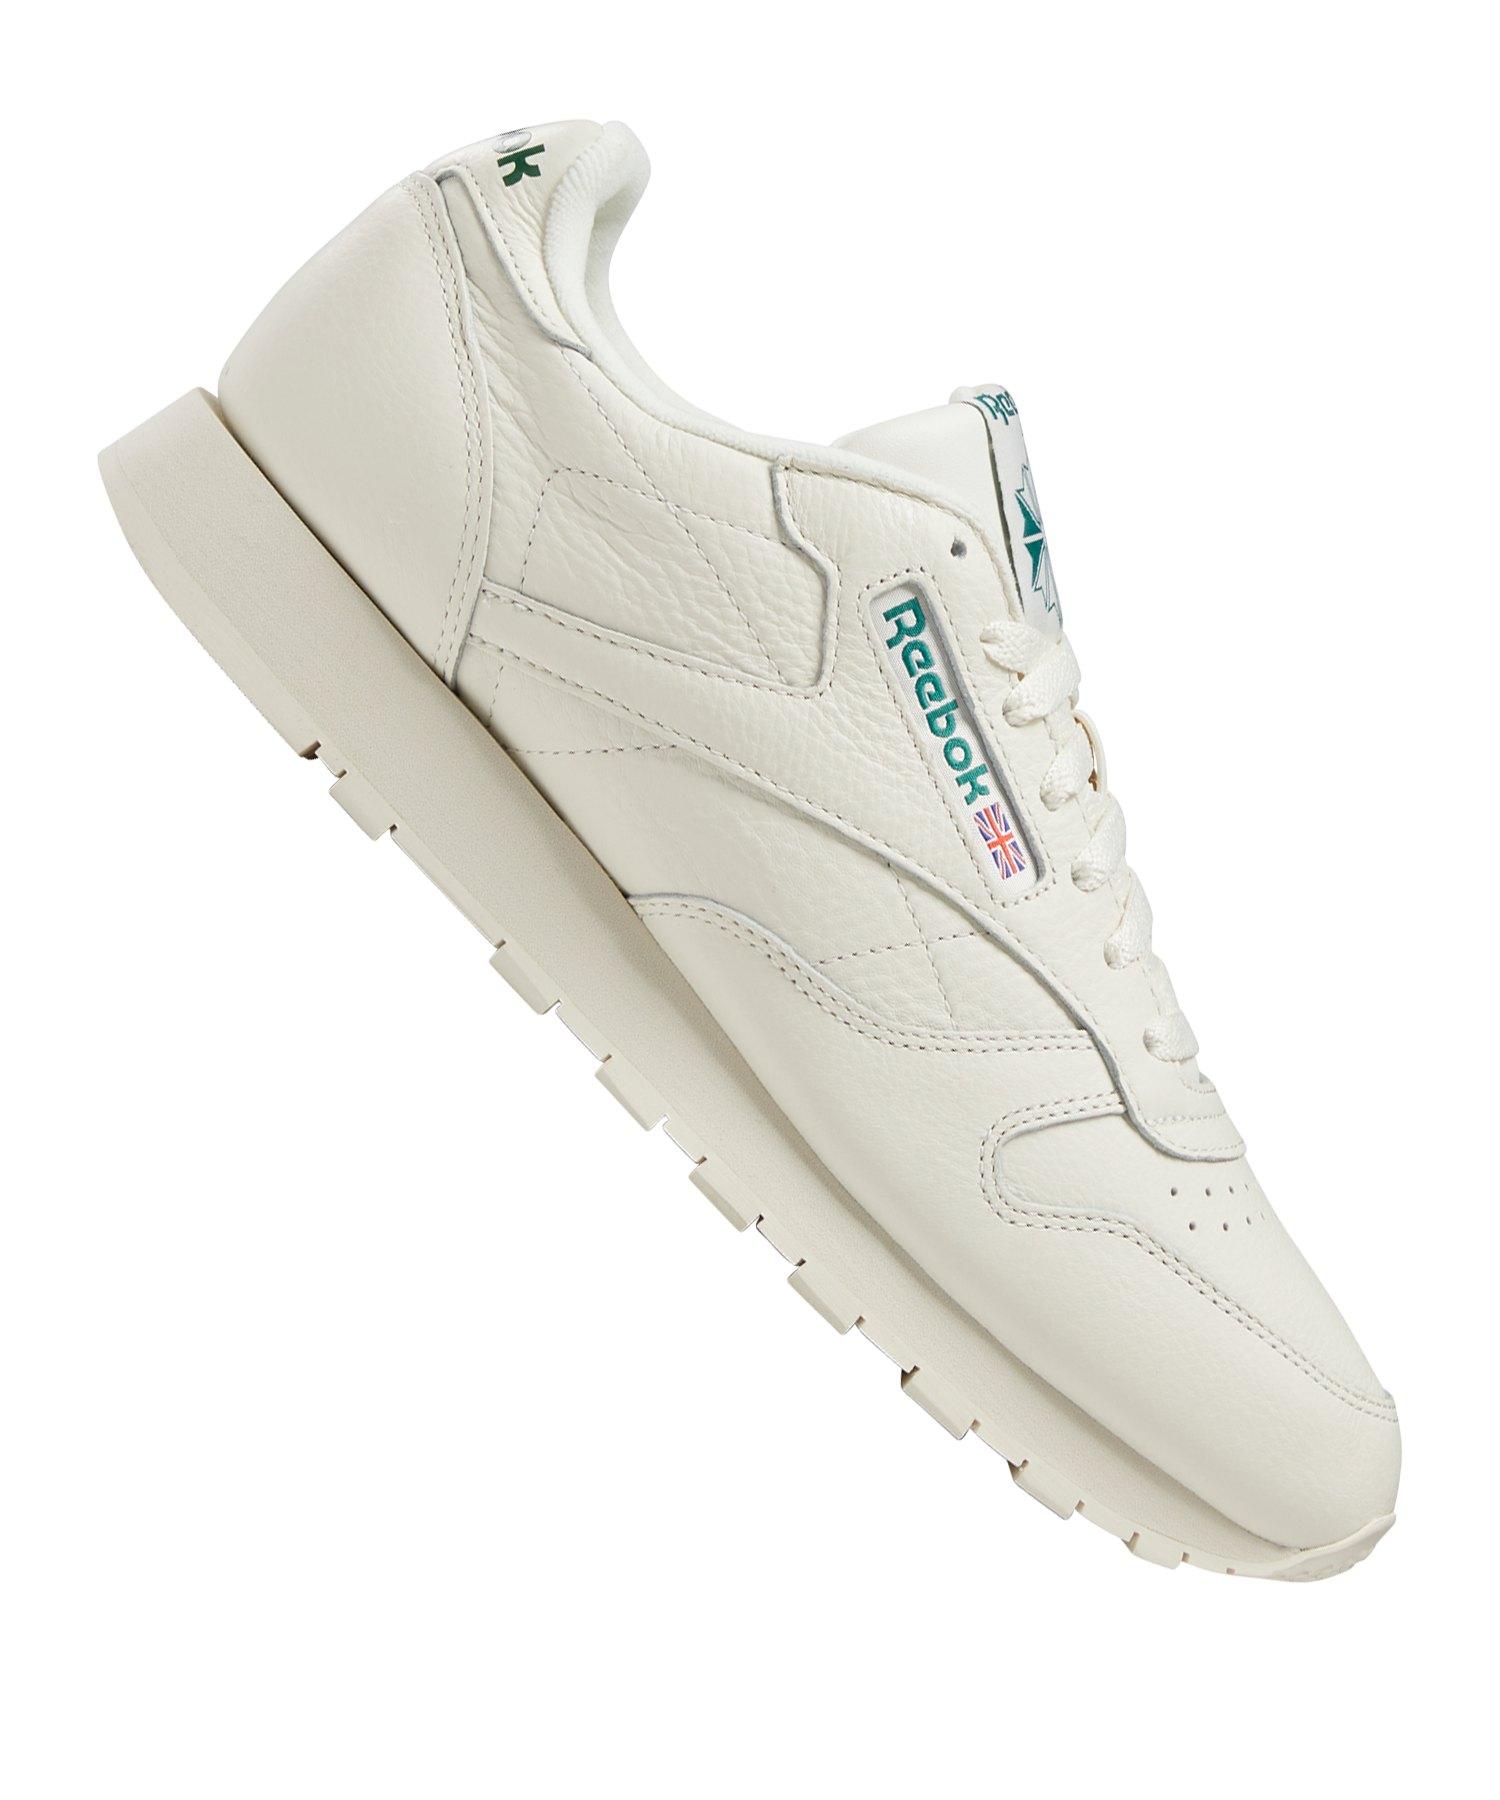 brand new 0a46d a5d80 Reebok Classic Leather Sneaker Beige